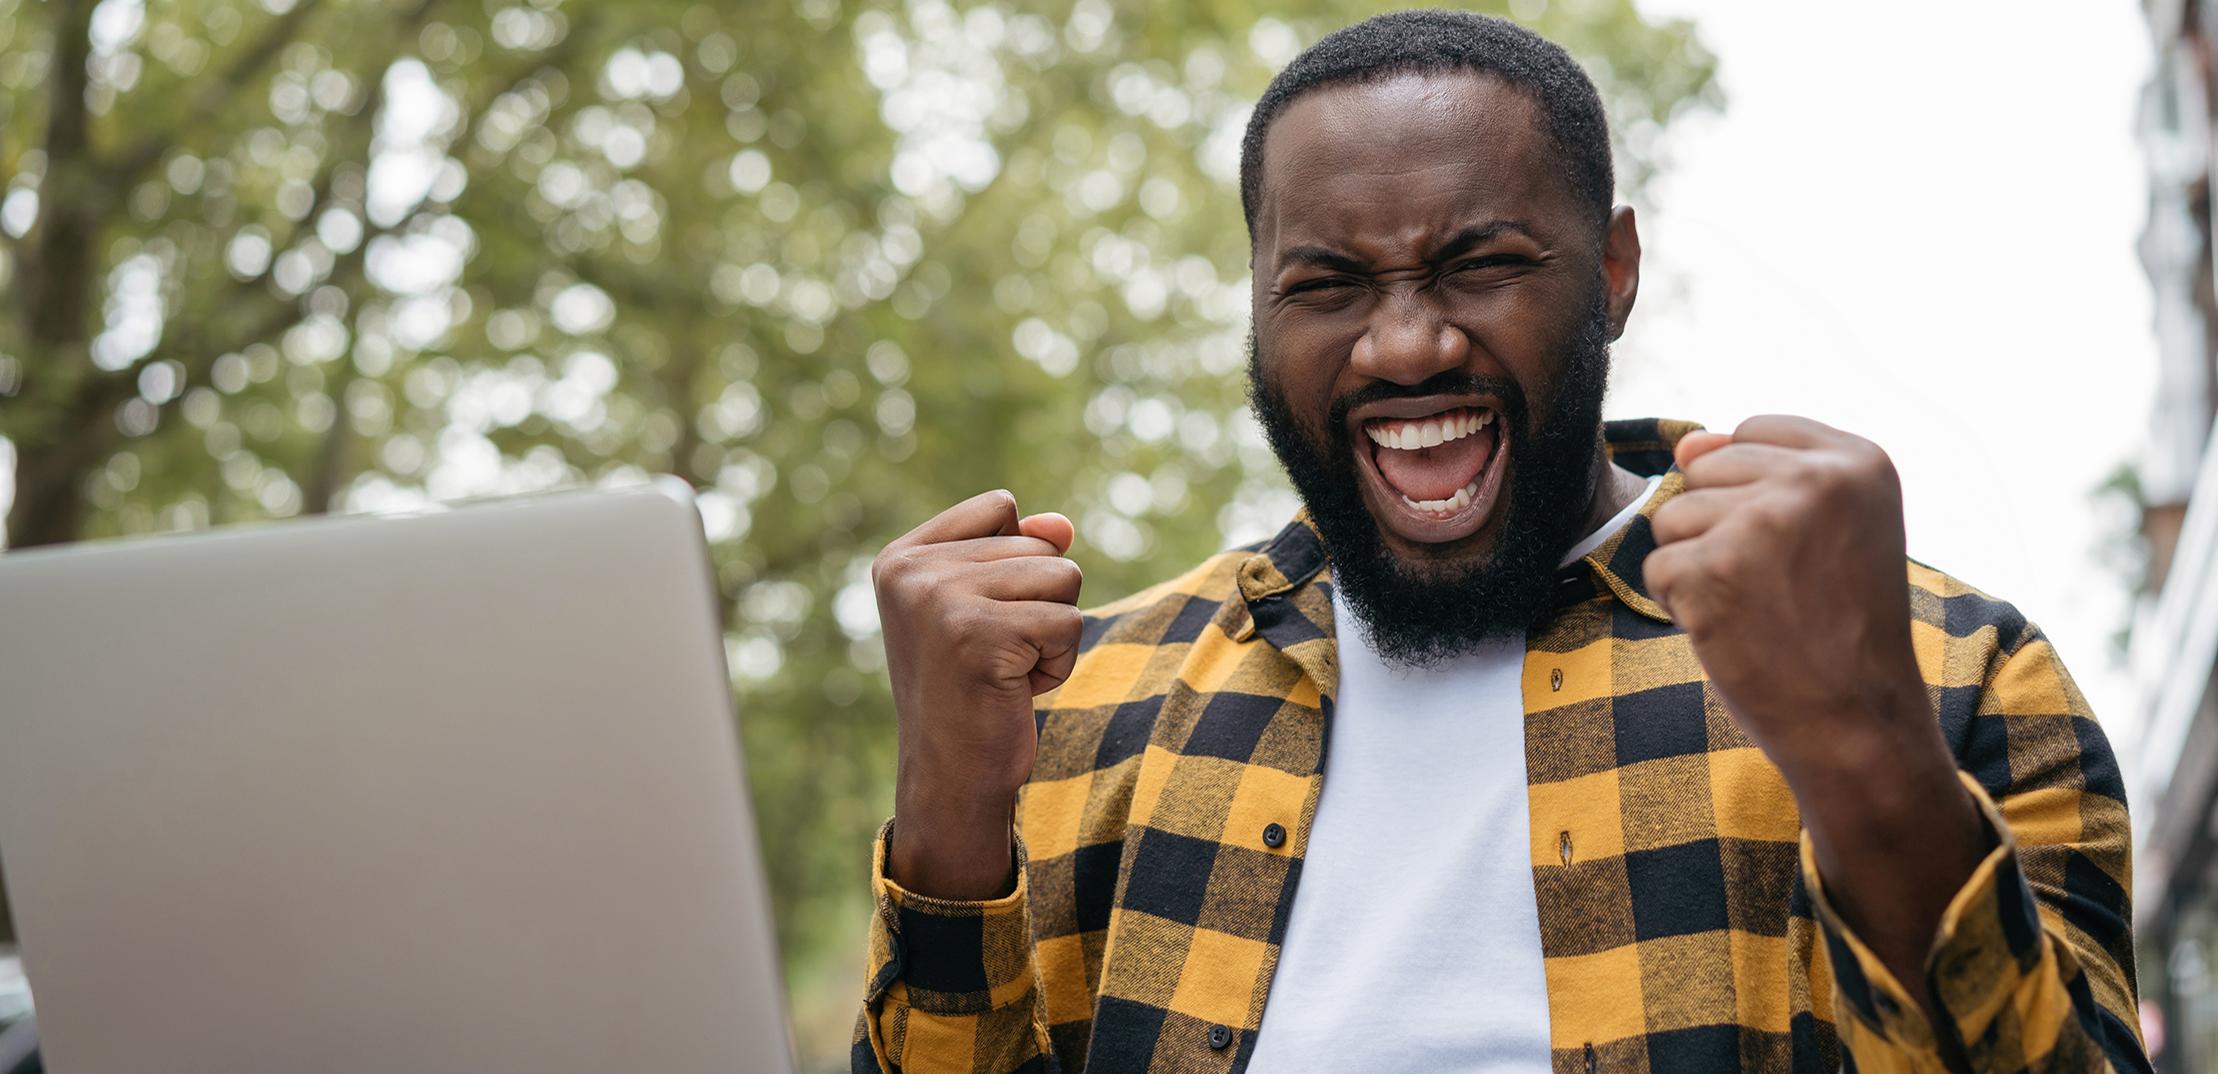 emotional man wins online